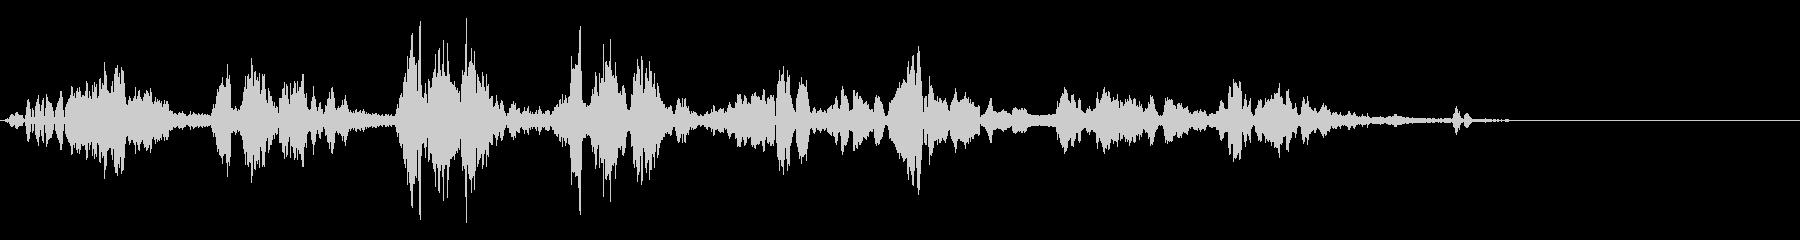 KANT 鳥のロボット声効果音2の未再生の波形